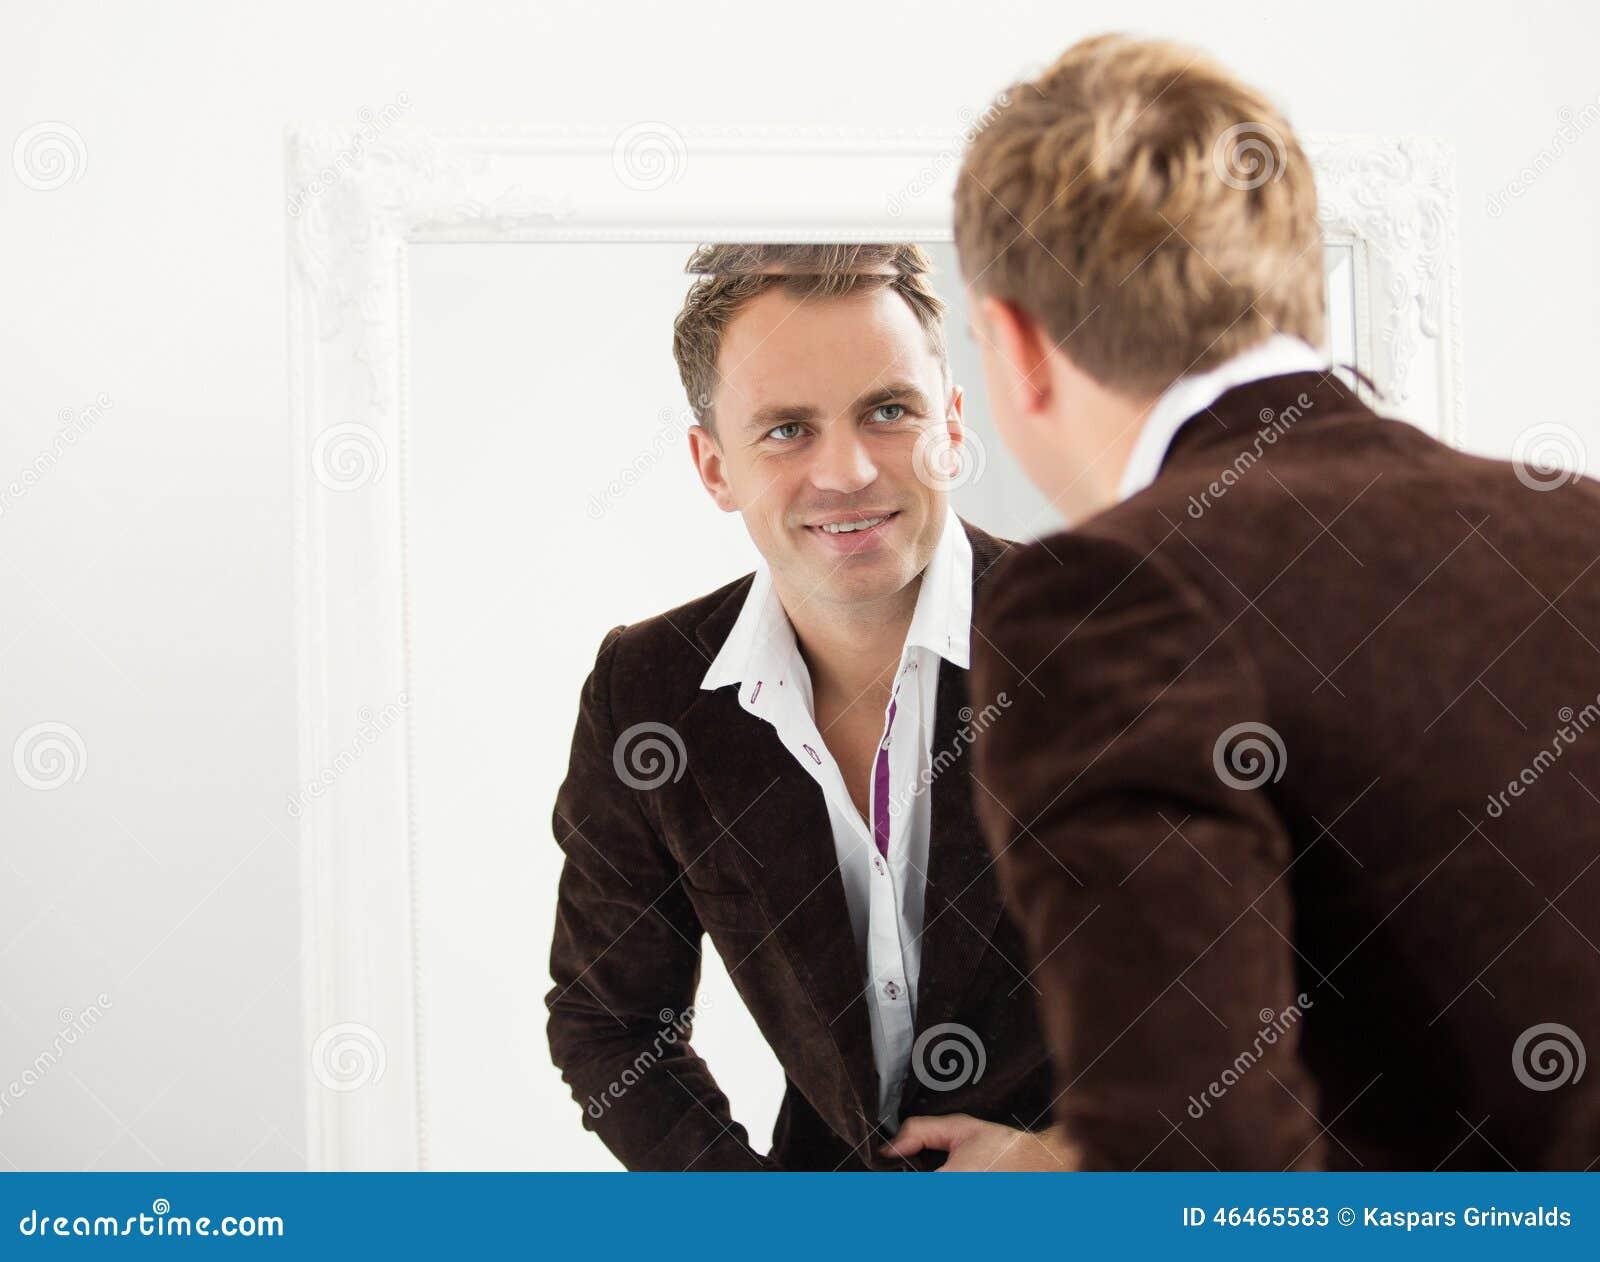 man looking at himself in mirror stock photo 46465583 megapixl